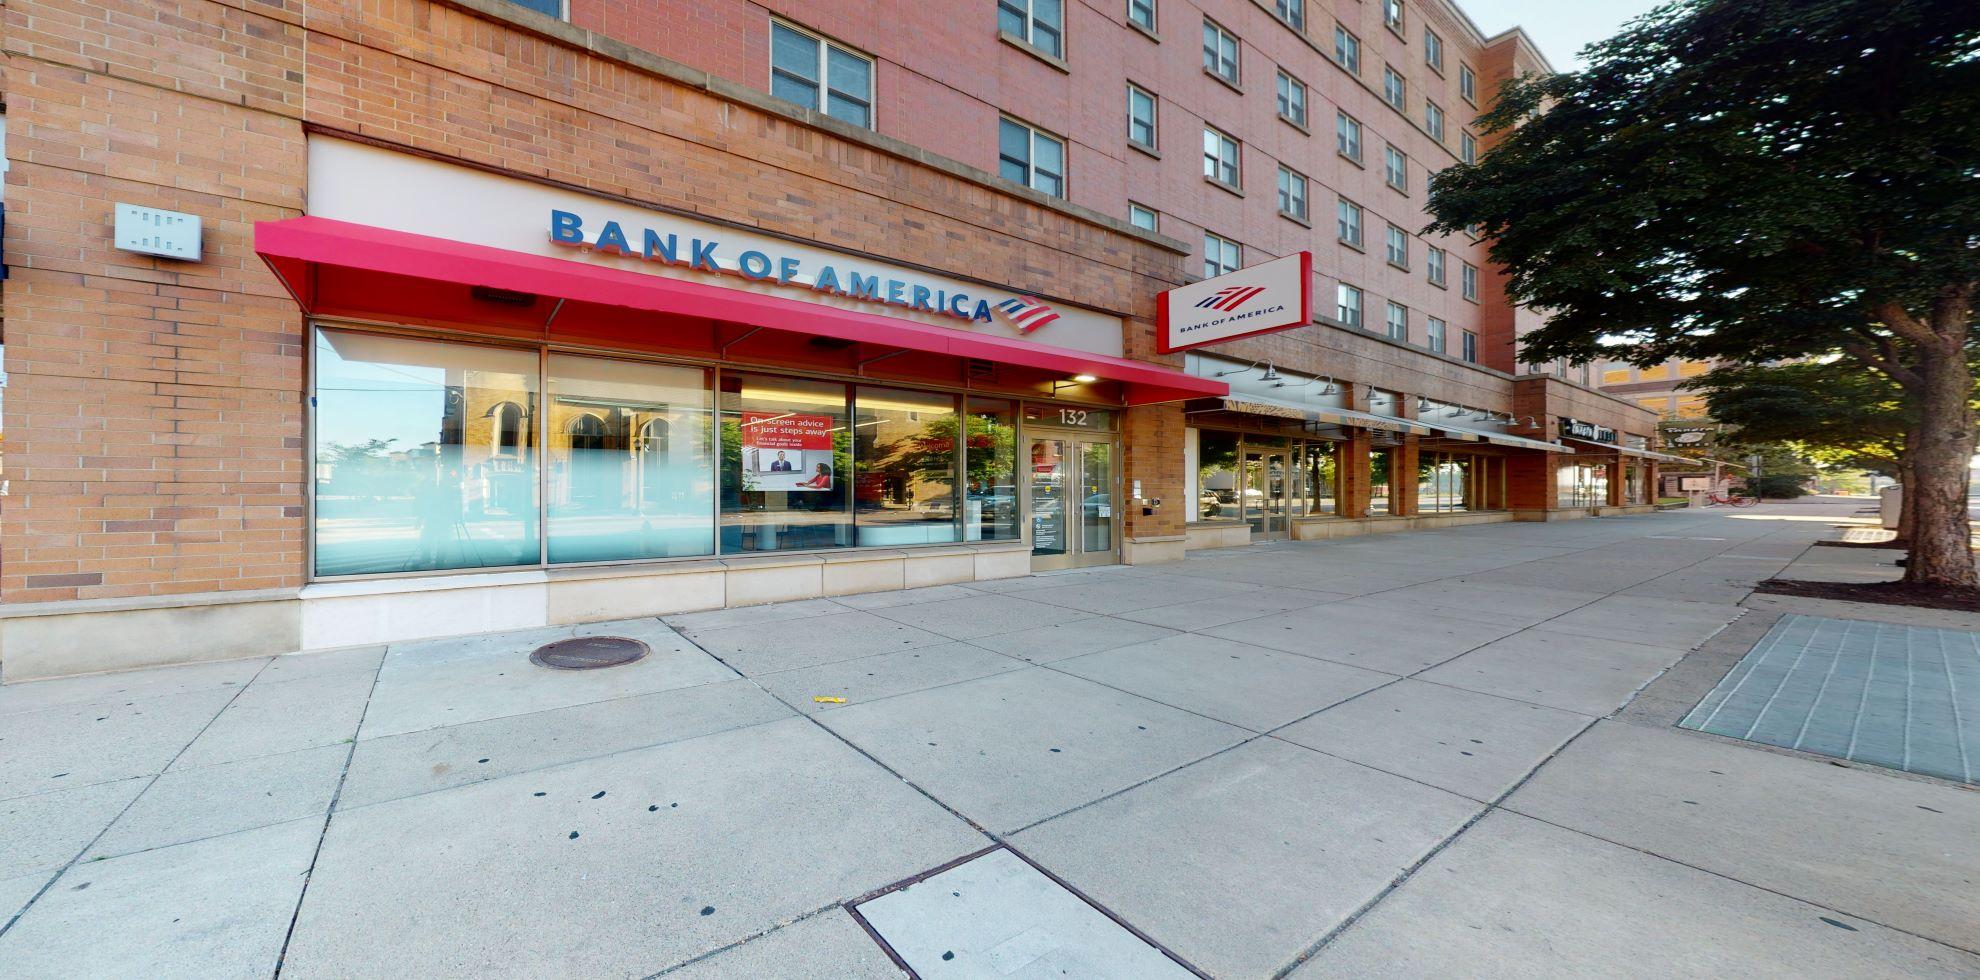 Bank of America Advanced Center with walk-up ATM   132 Calhoun St, Cincinnati, OH 45219